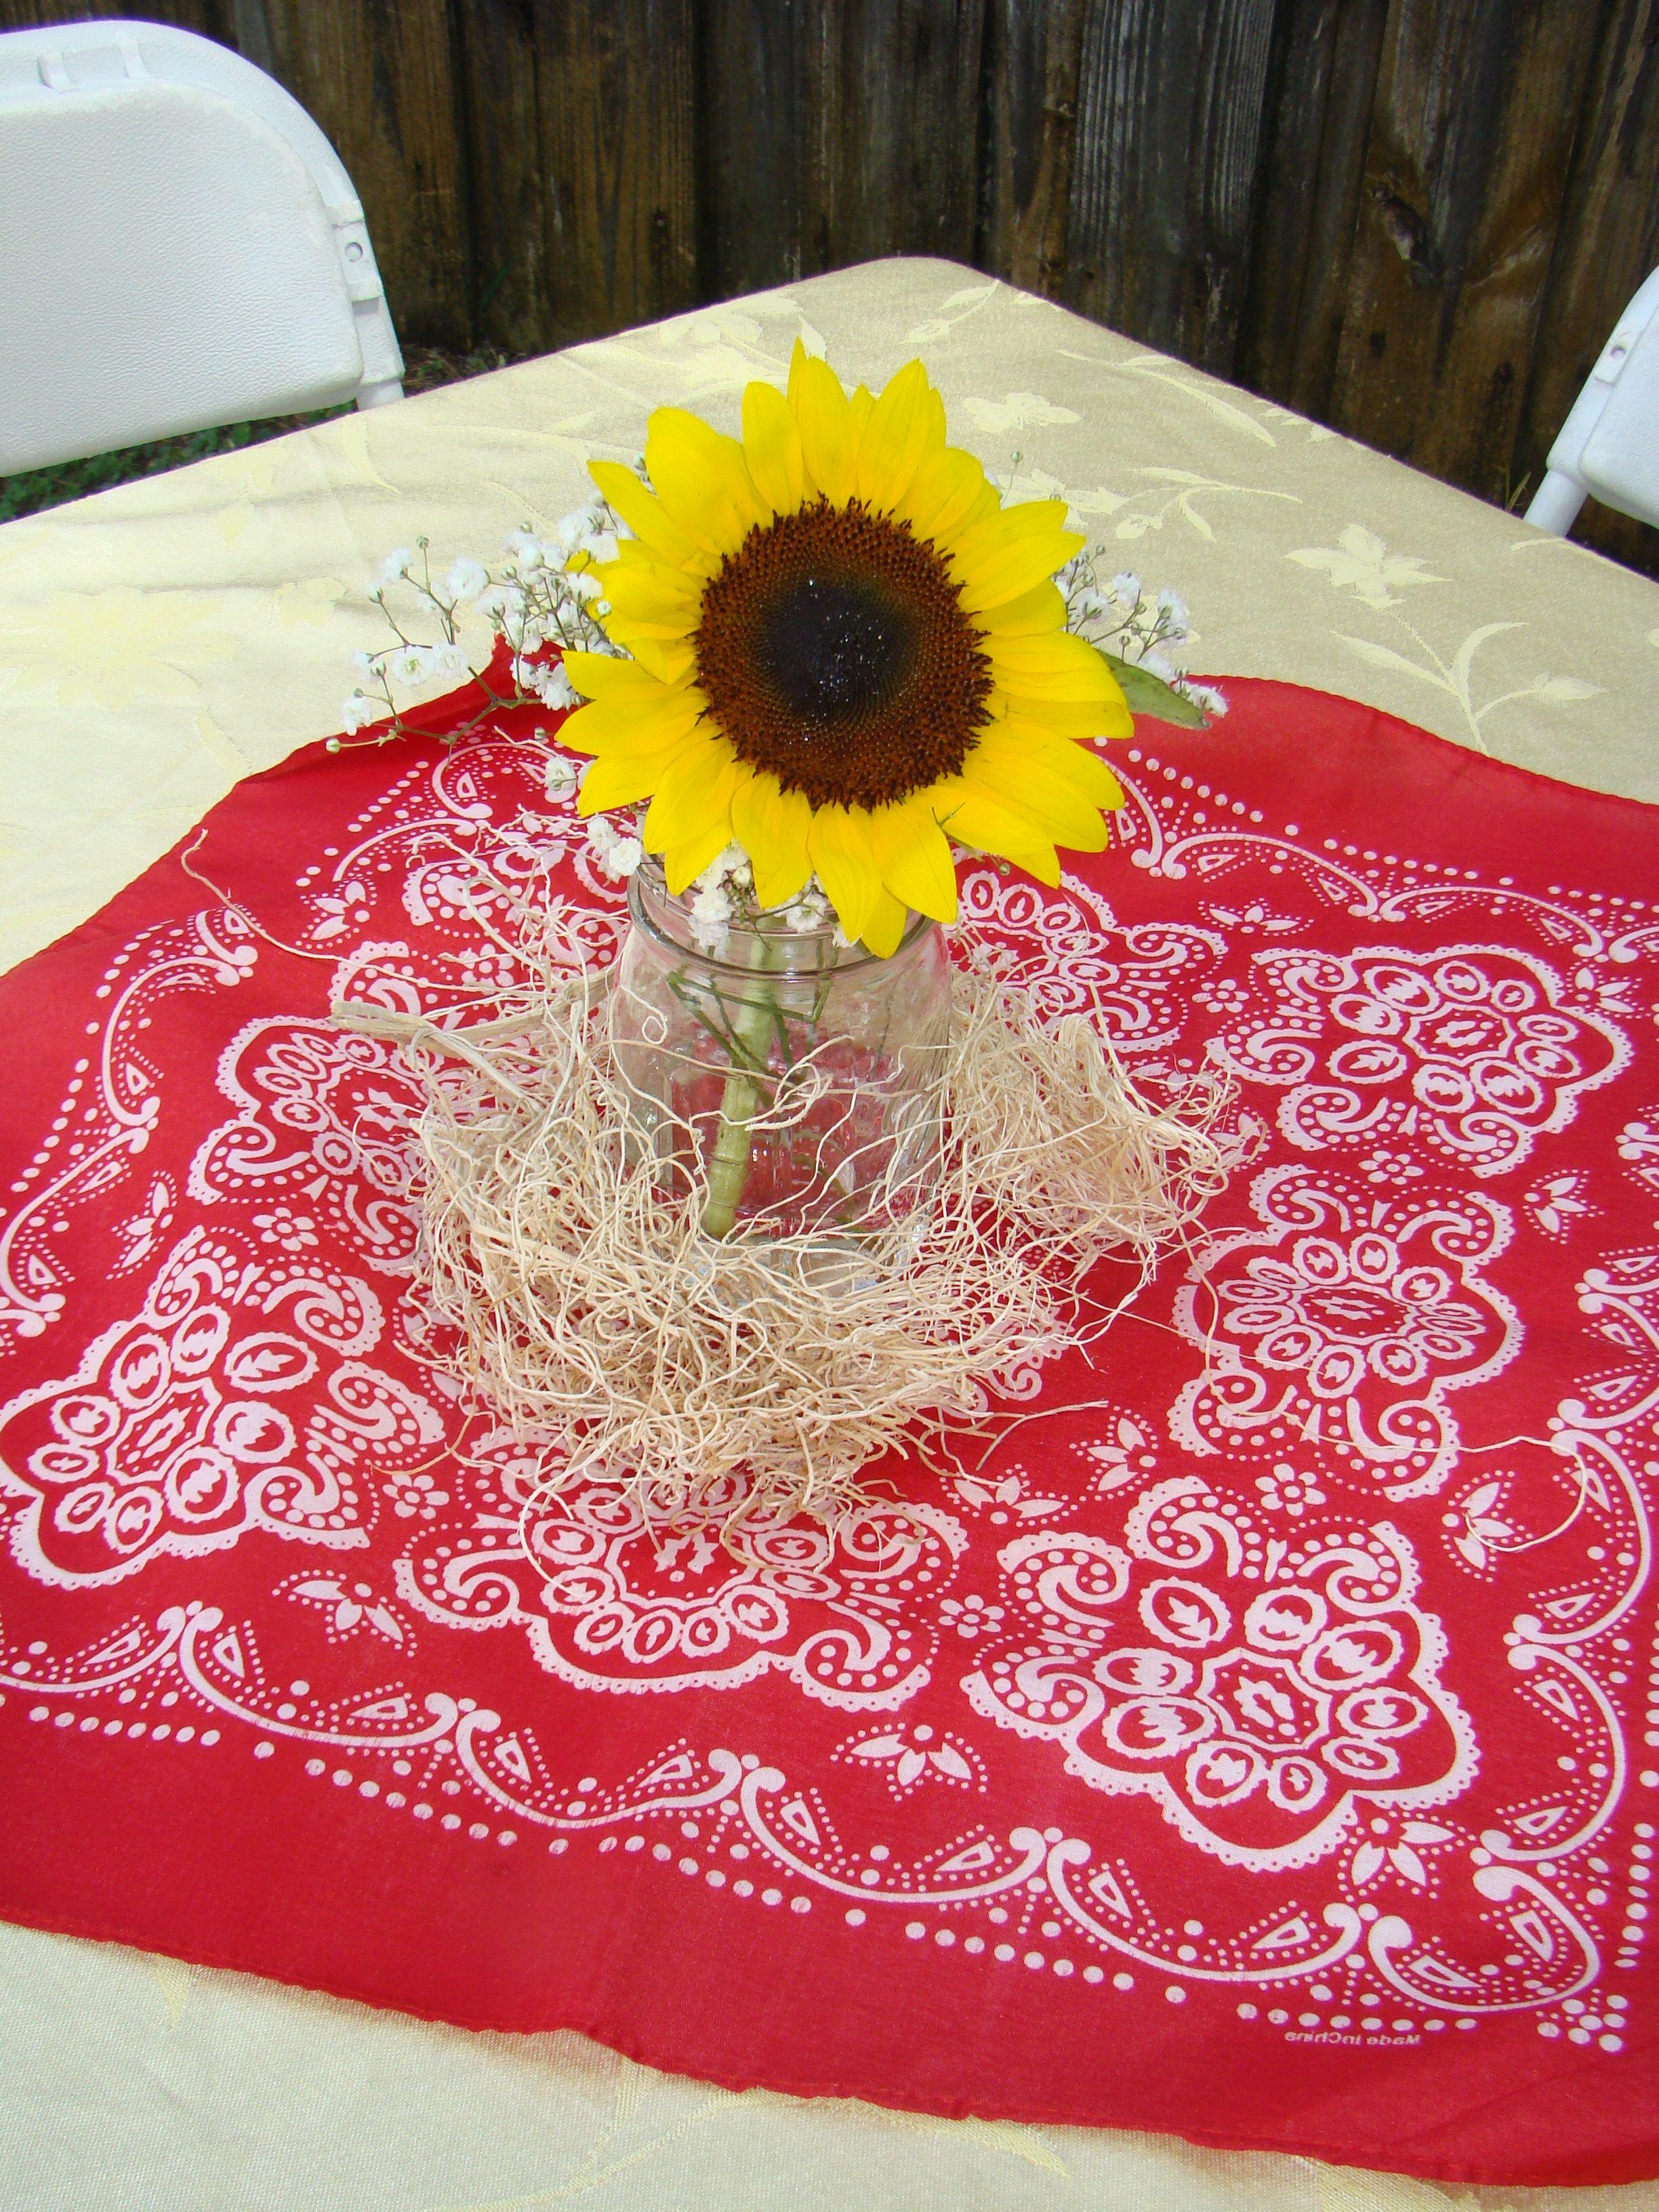 Pin By Chesta Hembrooke On Party Ideas Bandana Baby Shower Sunflower Baby Showers Baby Shower